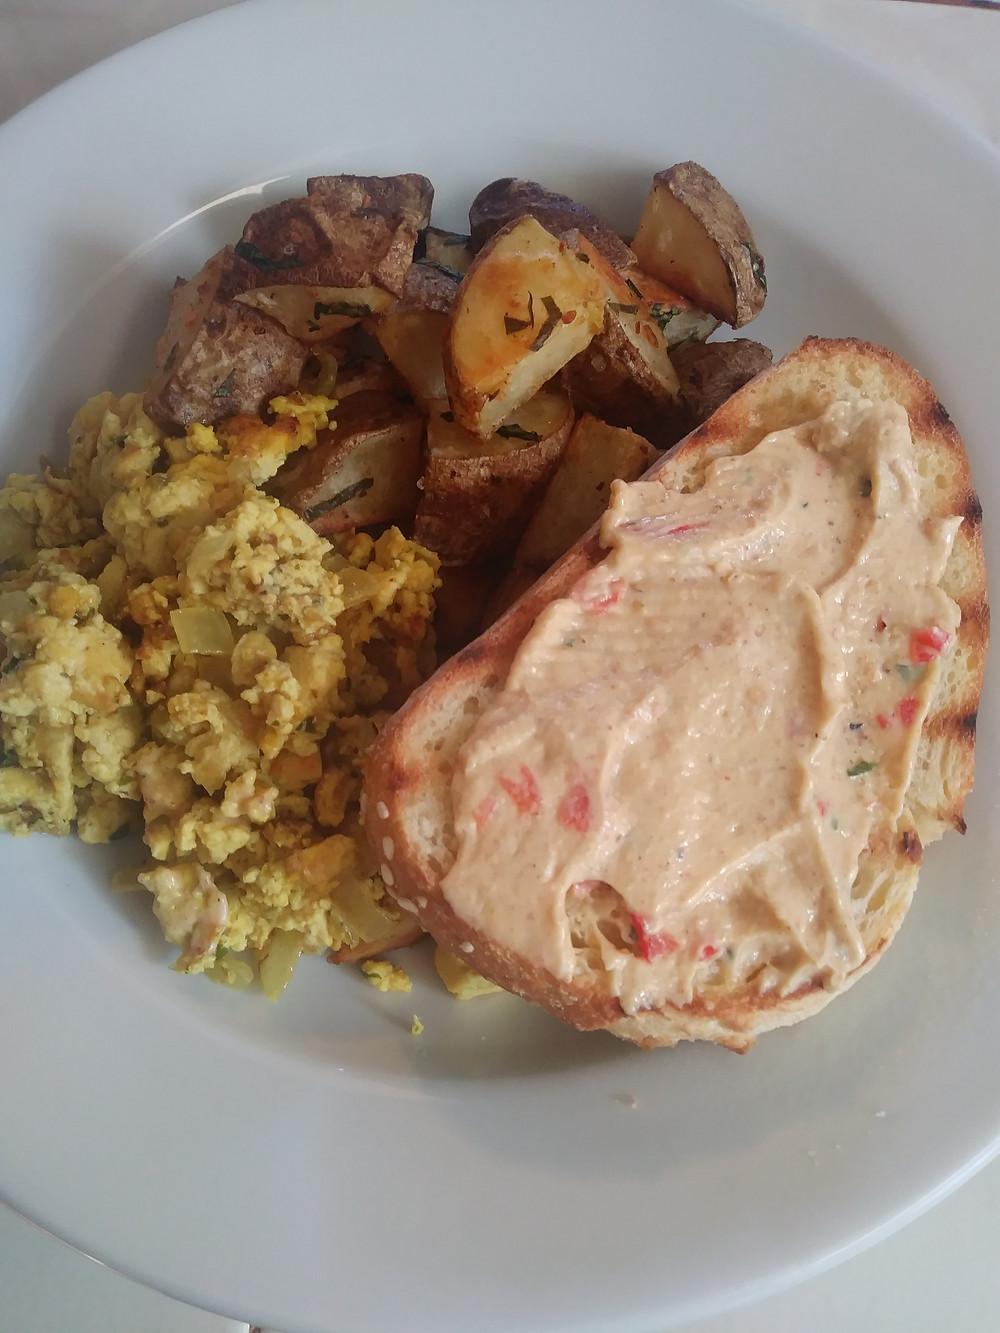 Tofu scramble breakfast plate